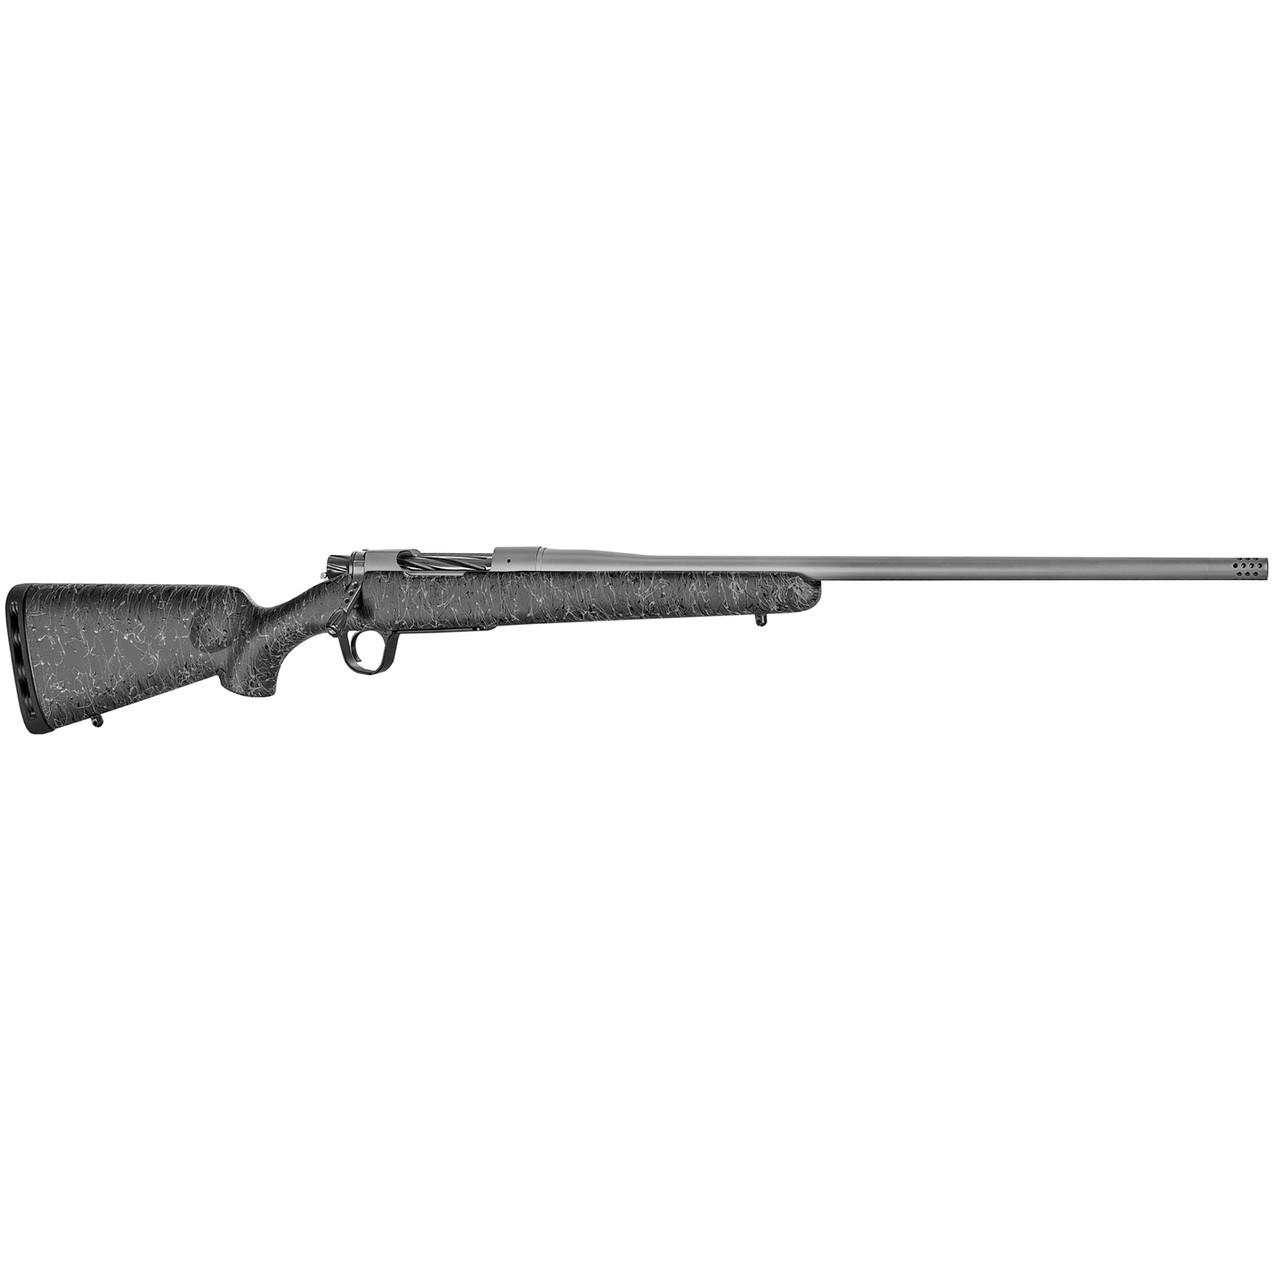 "Christensen Arms Mesa 22"" CALIFORNIA LEGAL - 6.5 Creedmoor - Black w/ Gray Webbing"